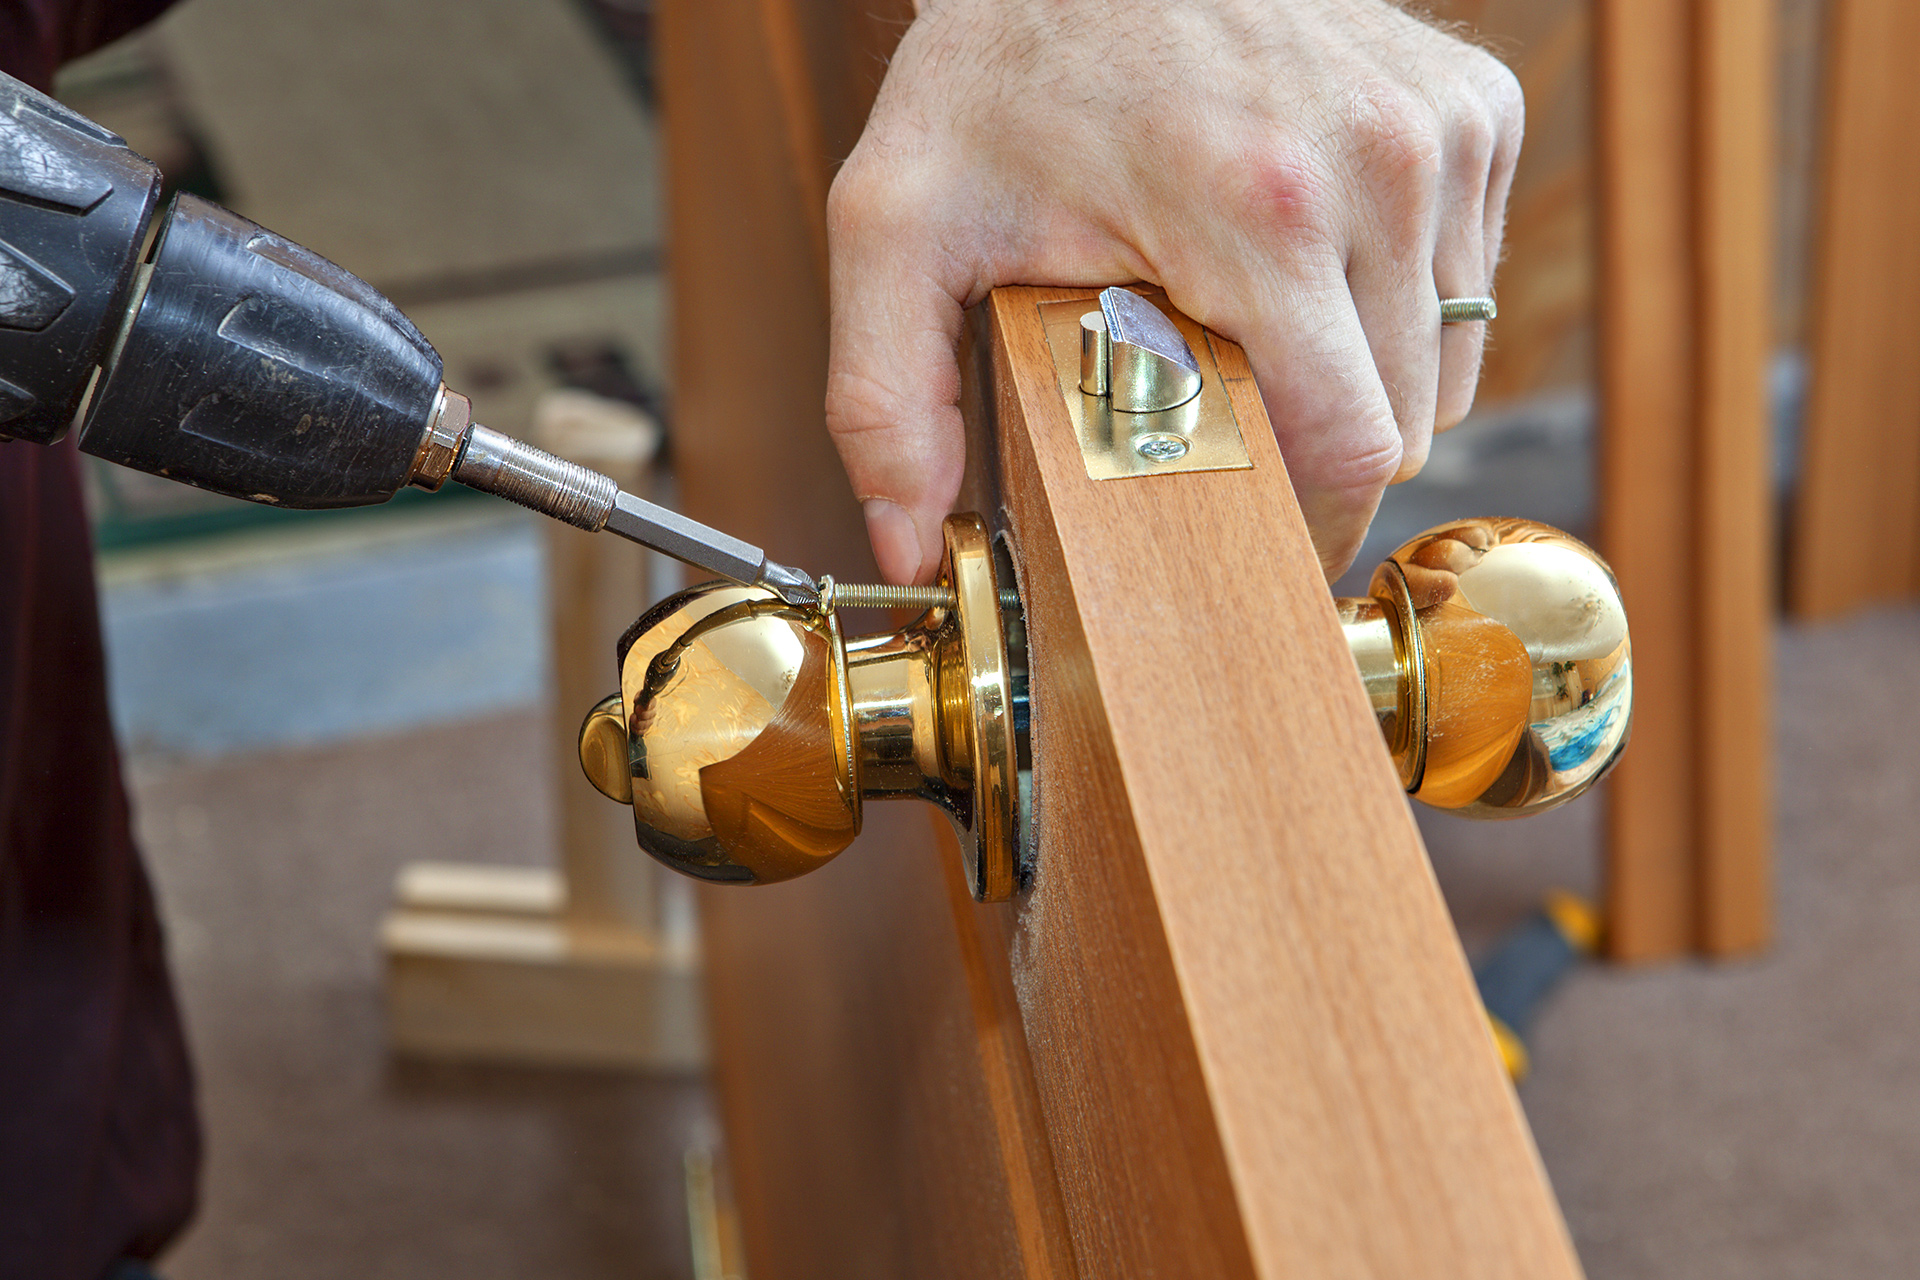 Montering dörrhandtag dörrakuten